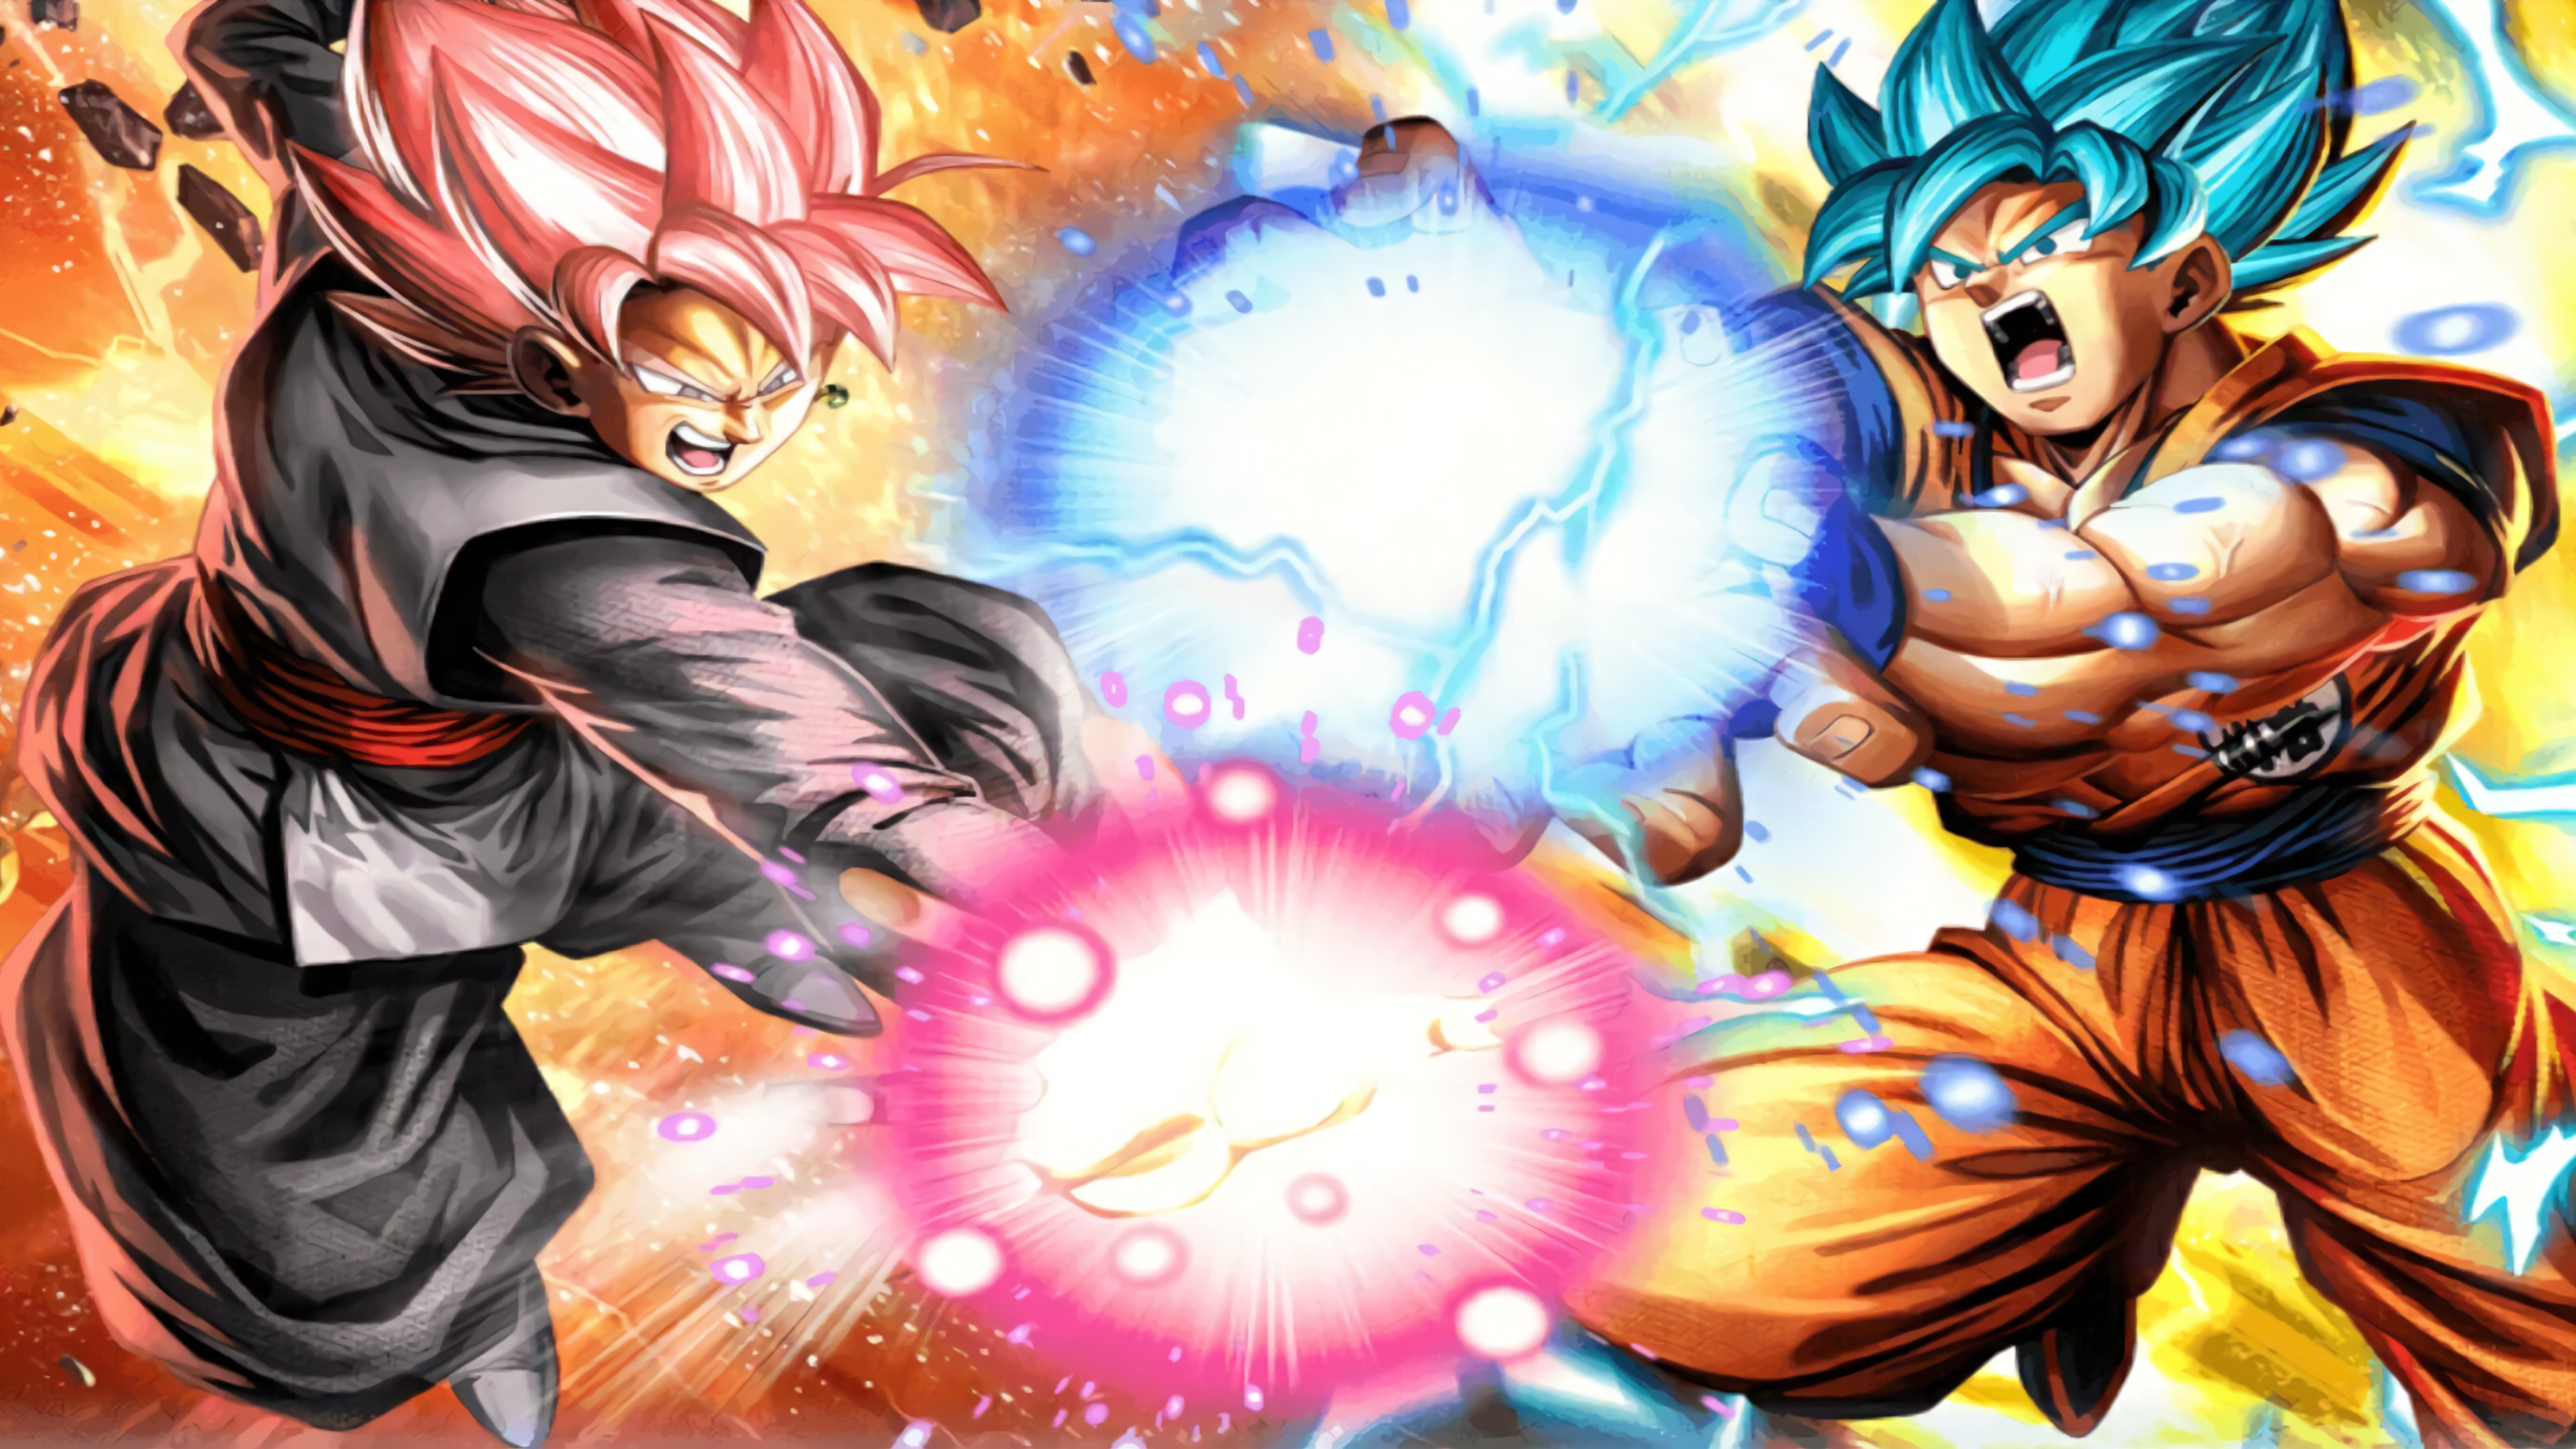 Black Goku Fondo De Pantalla And Fondo De Escritorio: Goku Black Wallpapers ·①